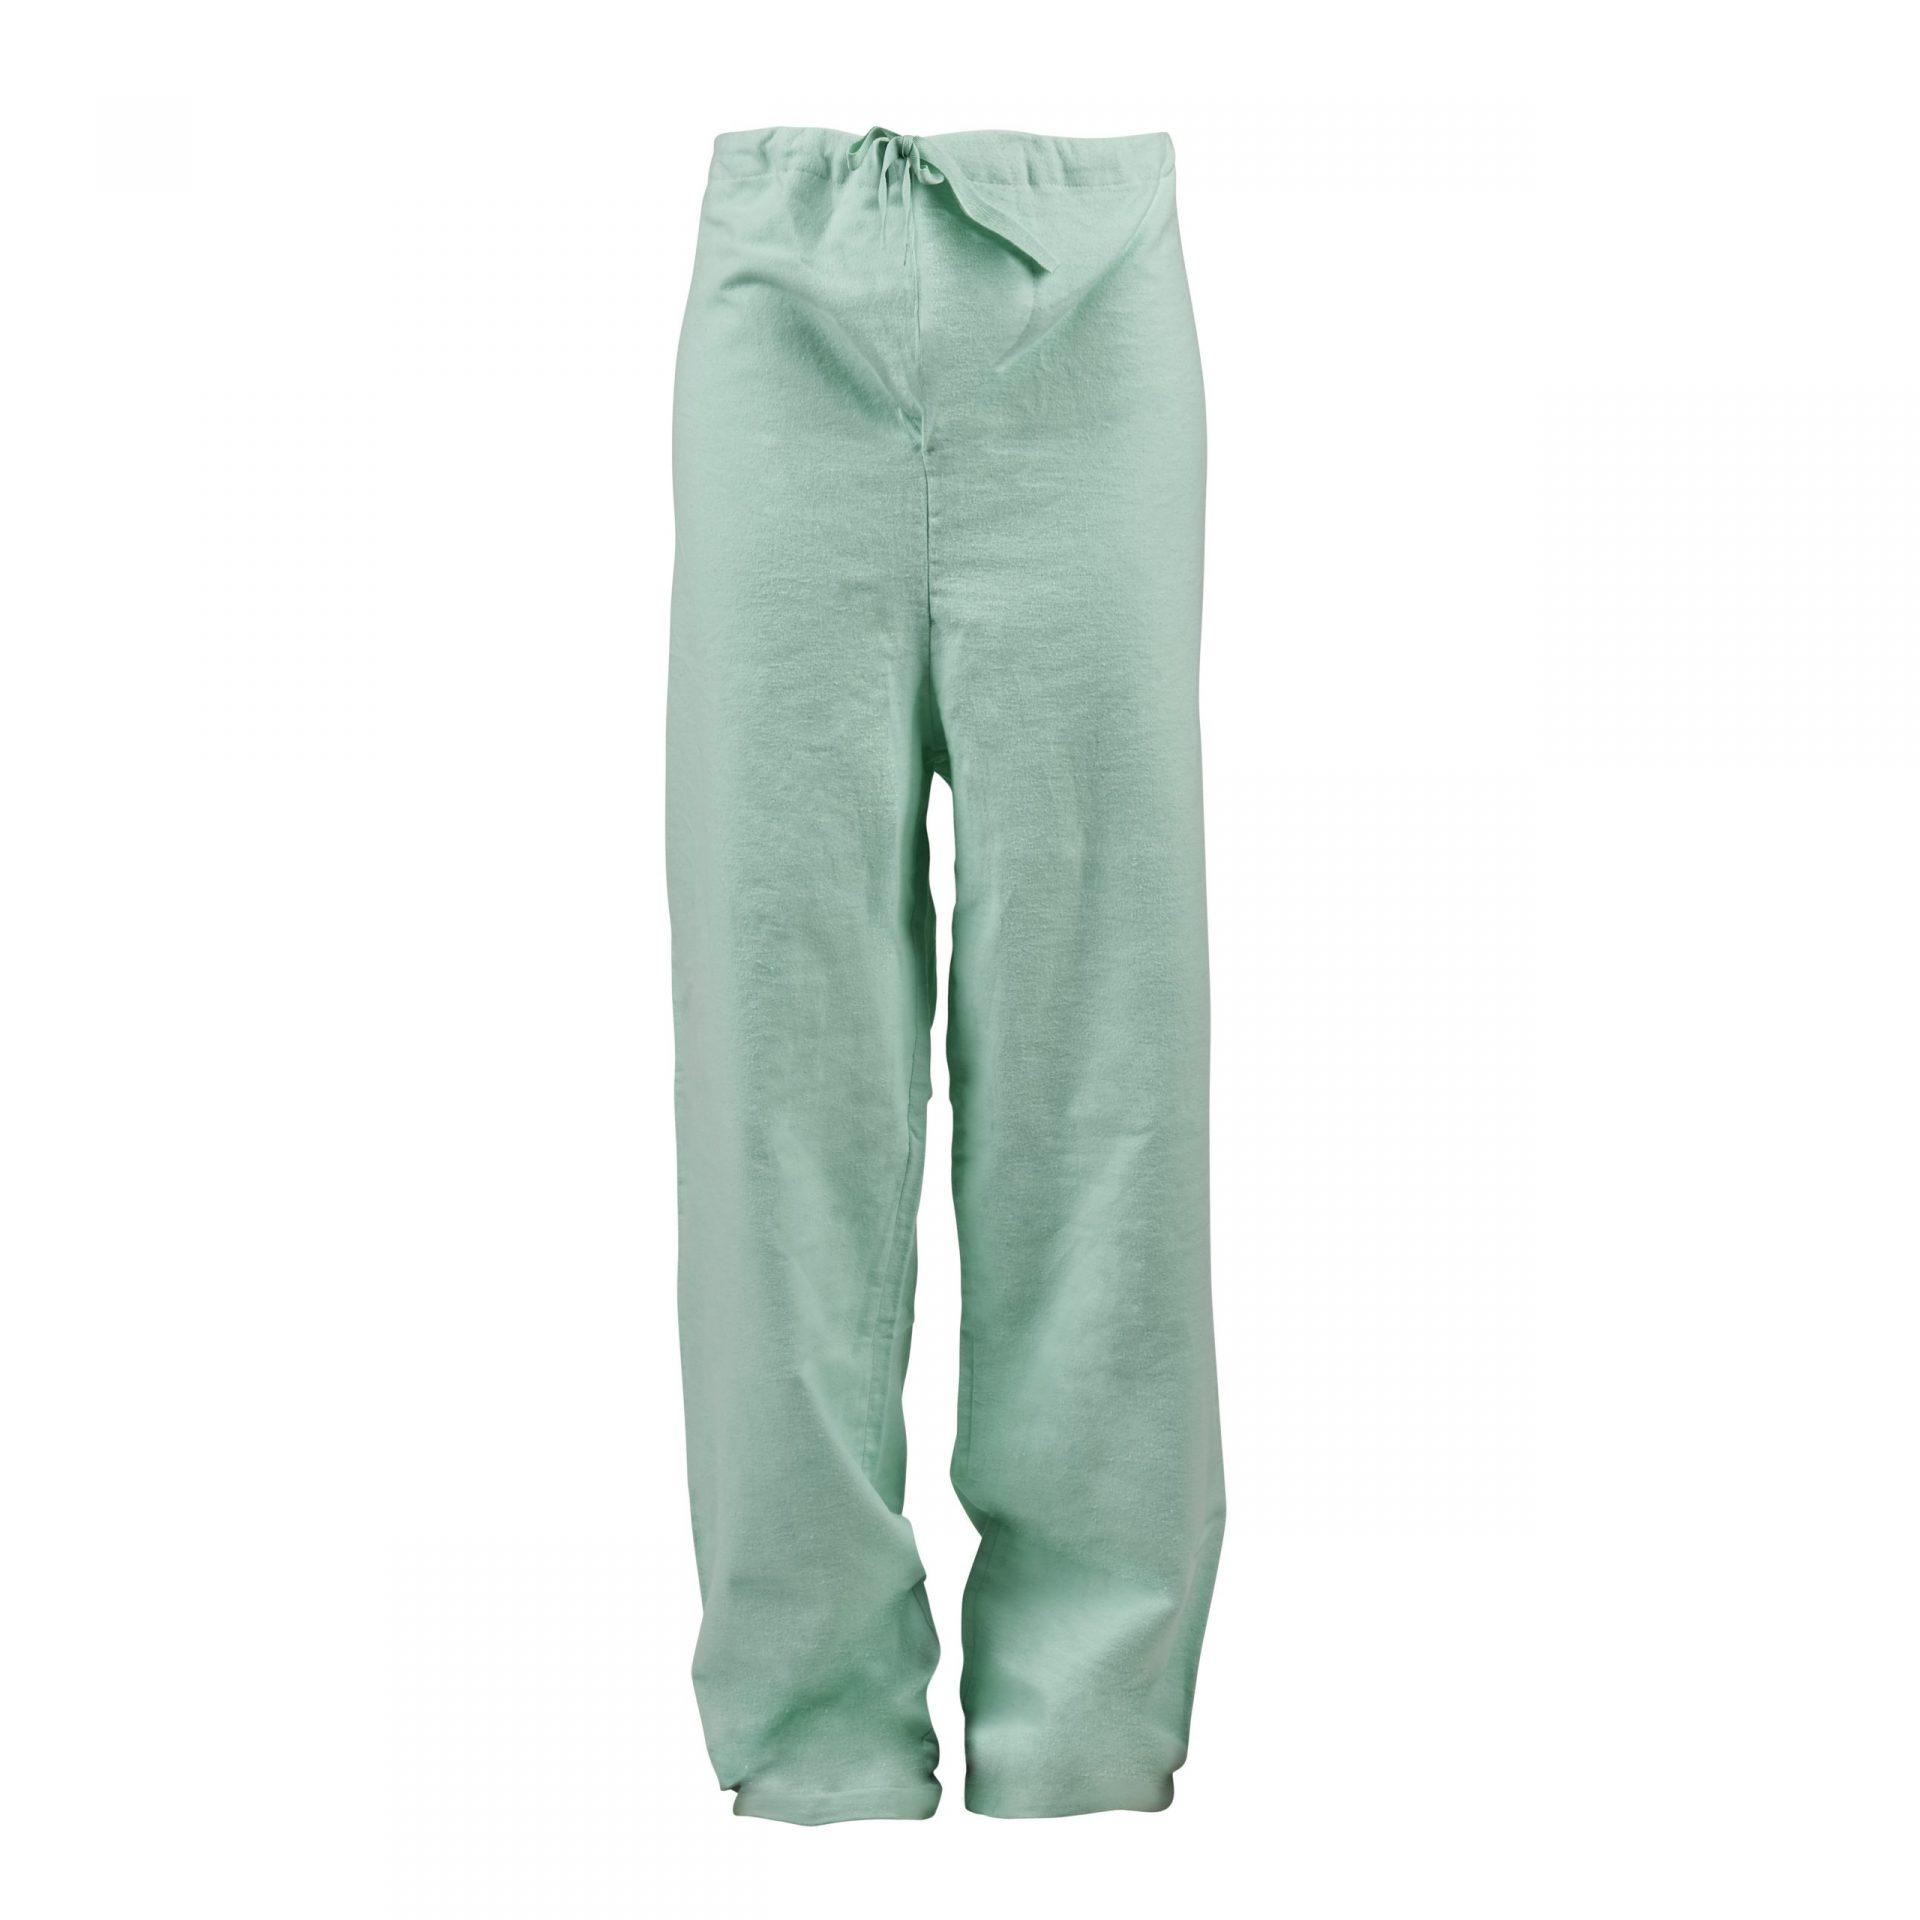 AT480_flannelette_pyjama_pants_drawstring